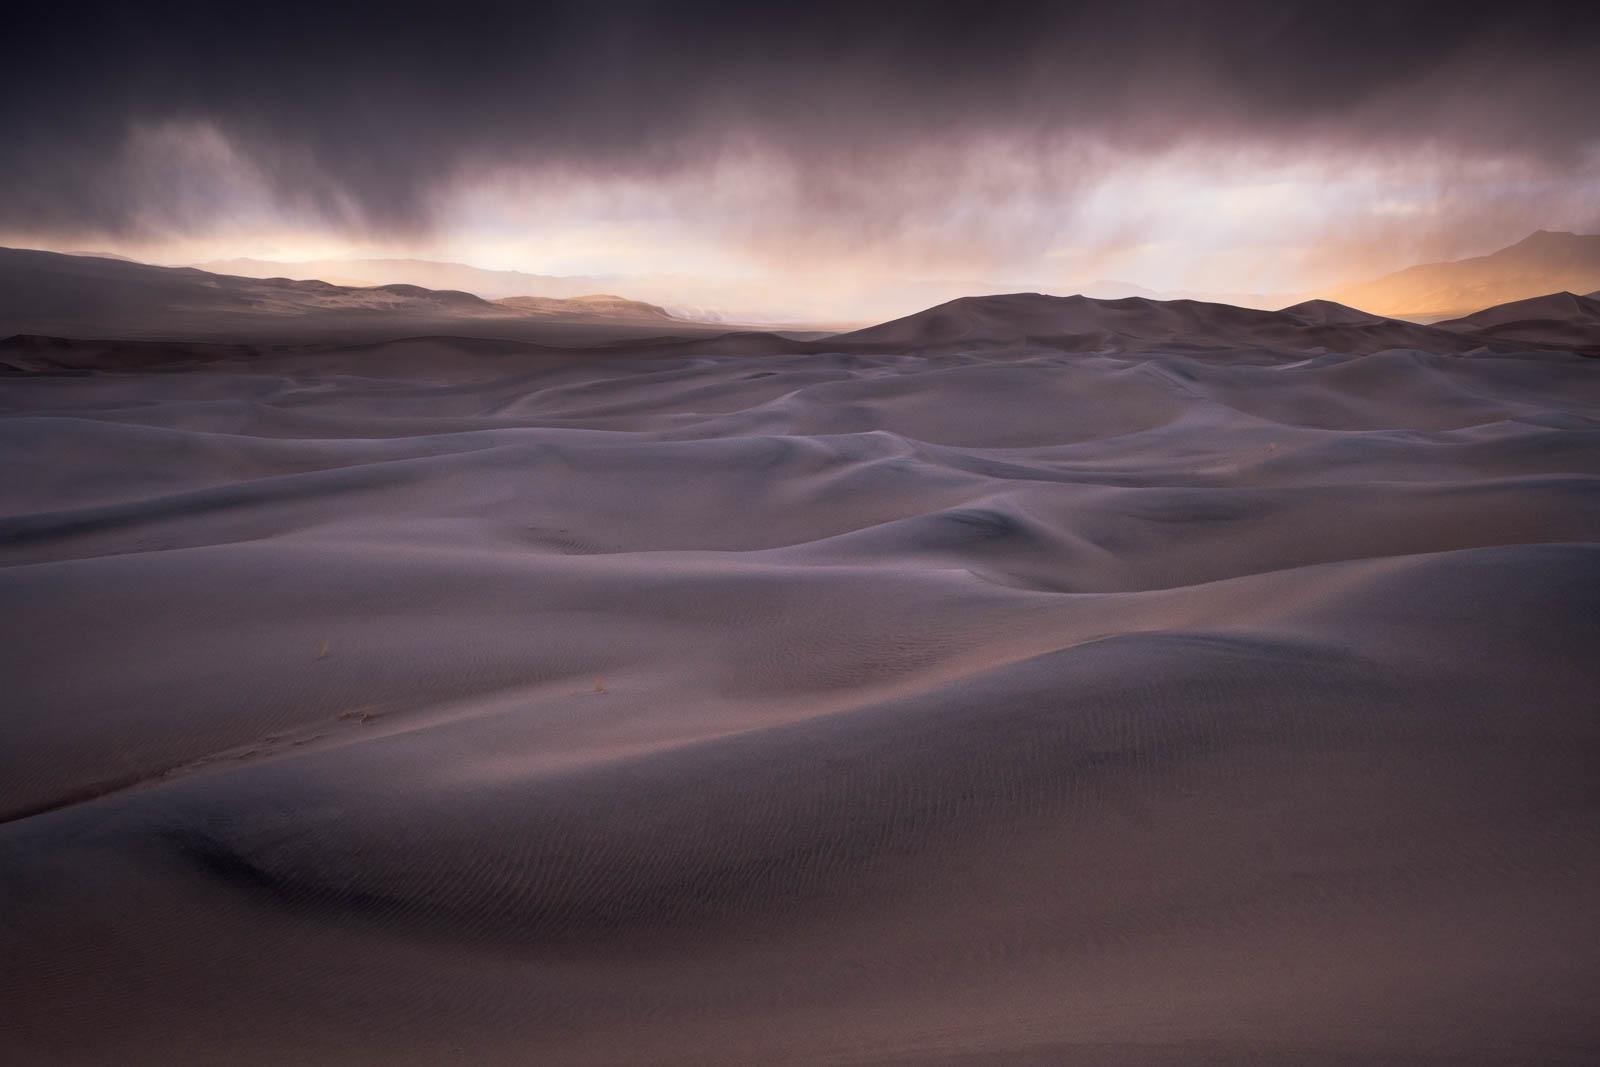 Time, brown, california, death valley national park, eureka dunes, landscape orientation, mojave desert, sand dunes, sunset